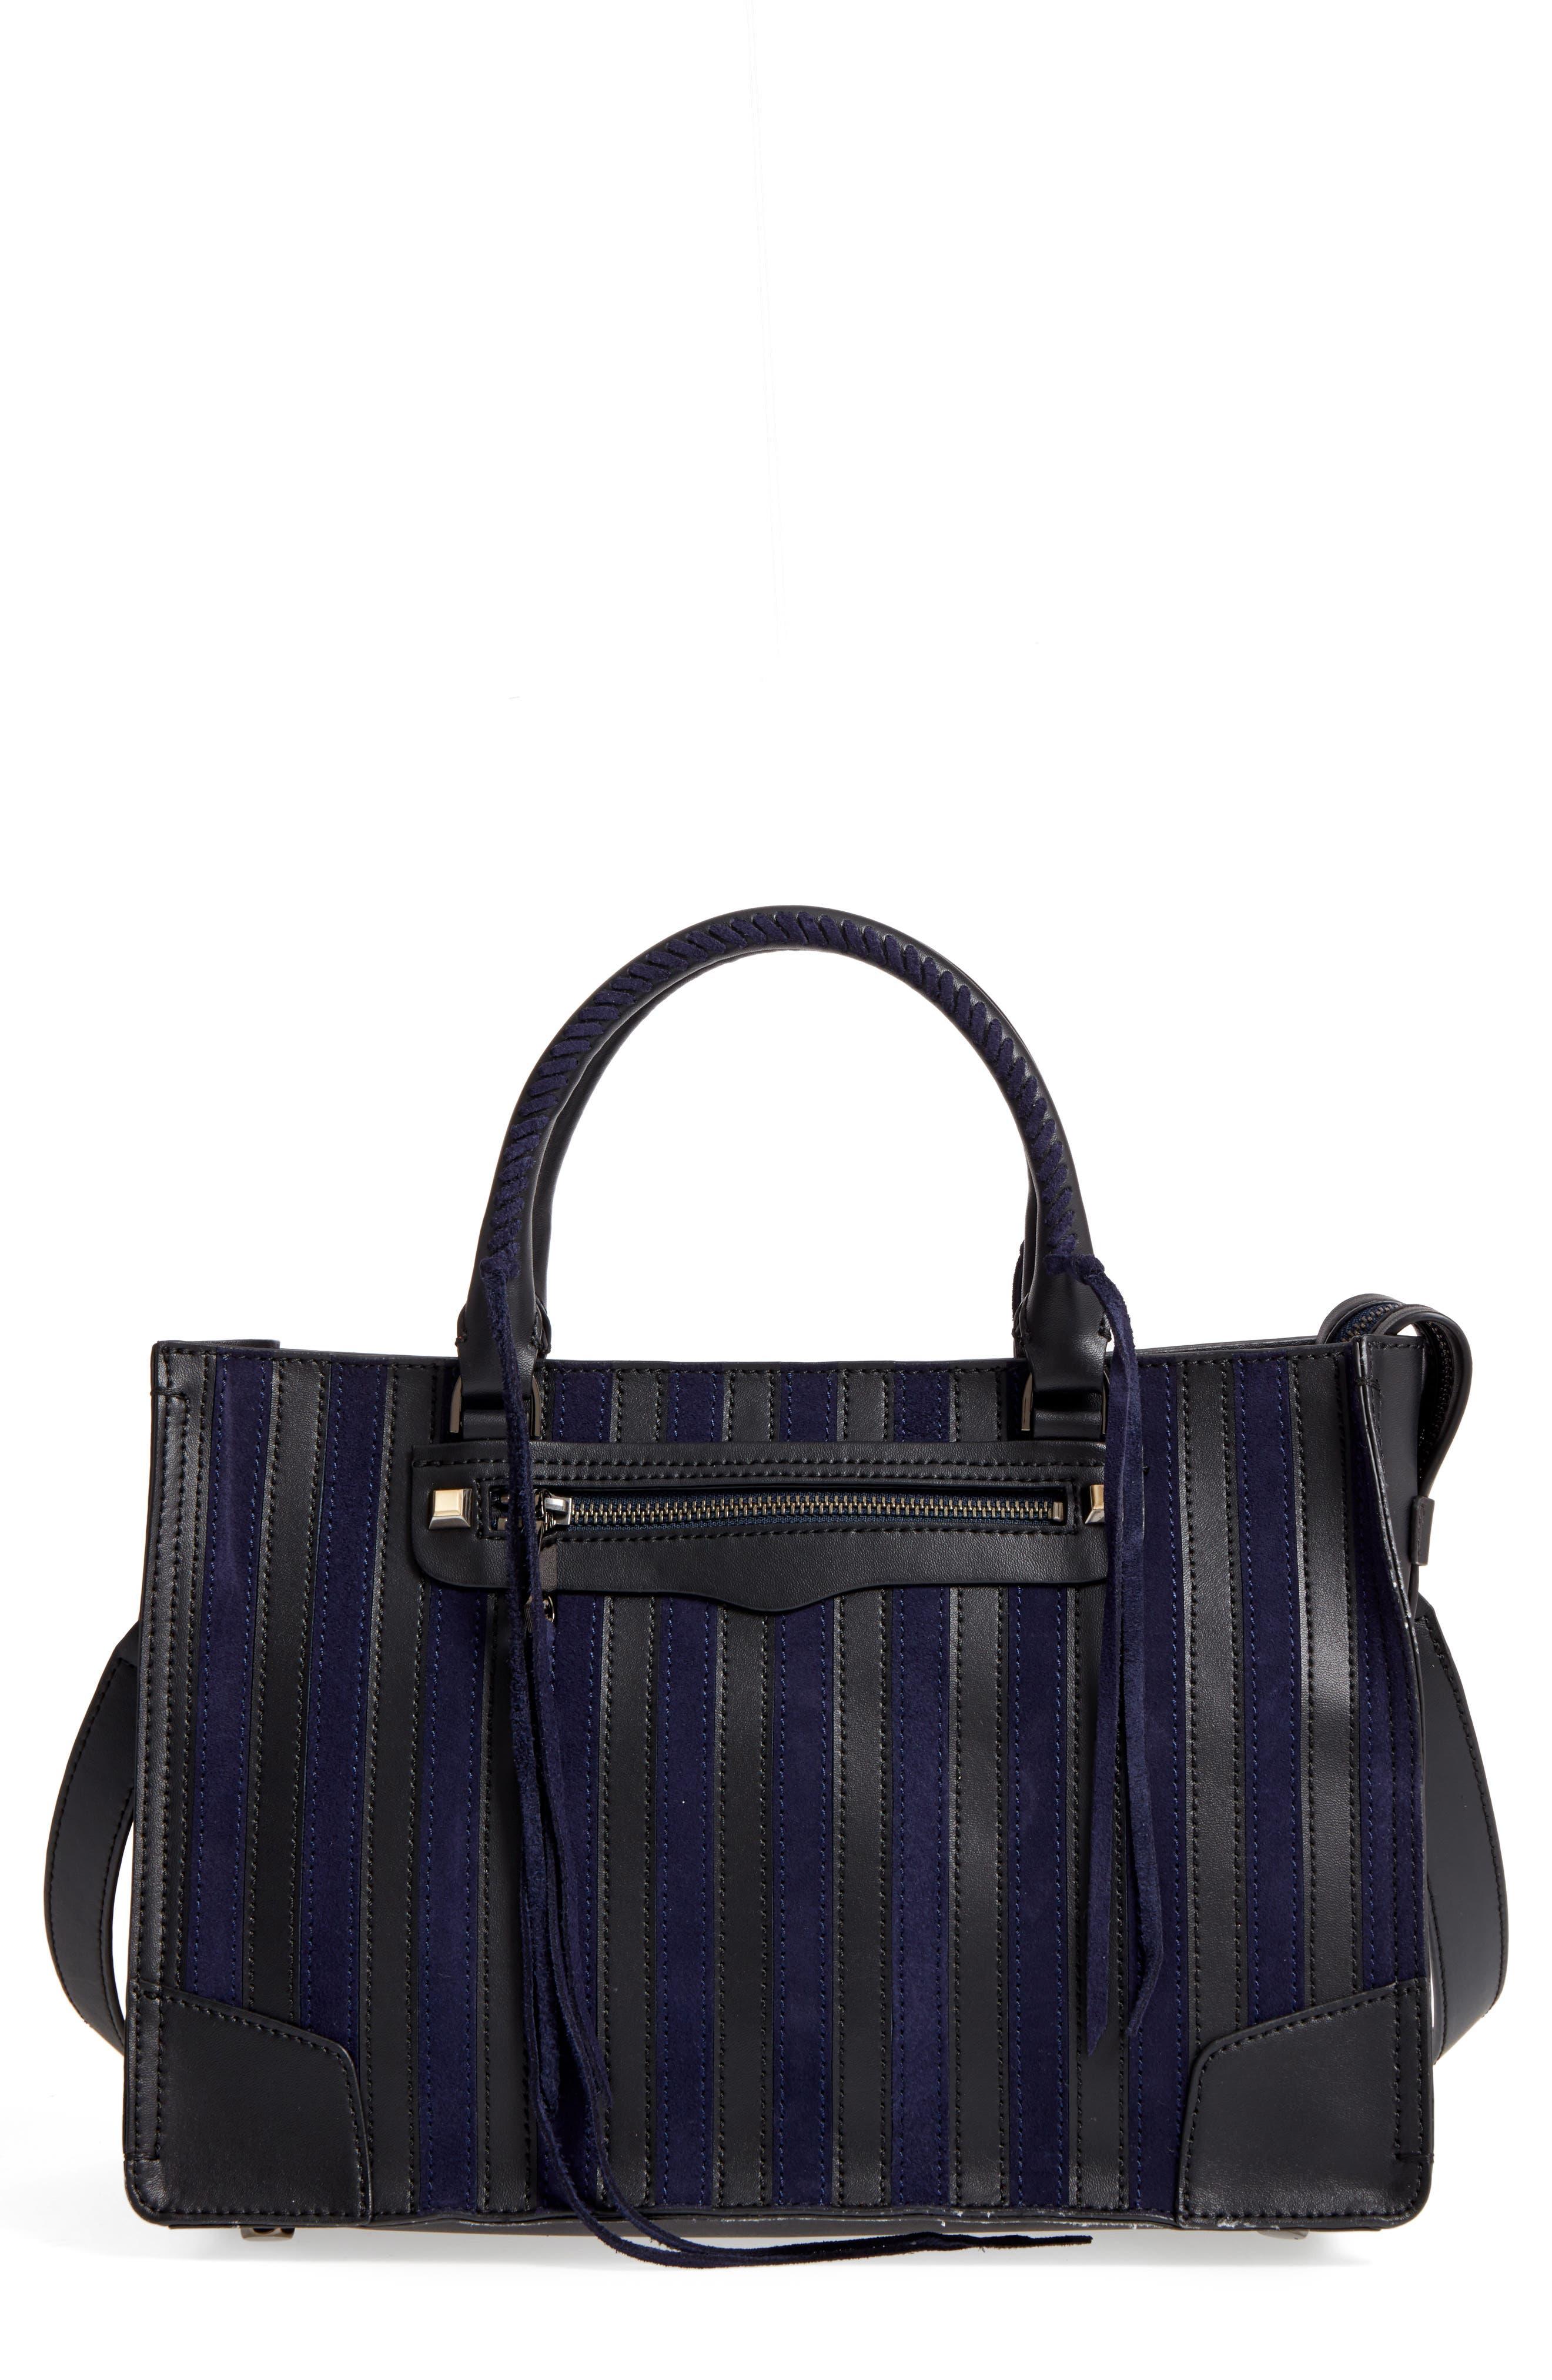 Alternate Image 1 Selected - Rebecca Minkoff Regan Stripe Leather & Suede Top Handle Satchel